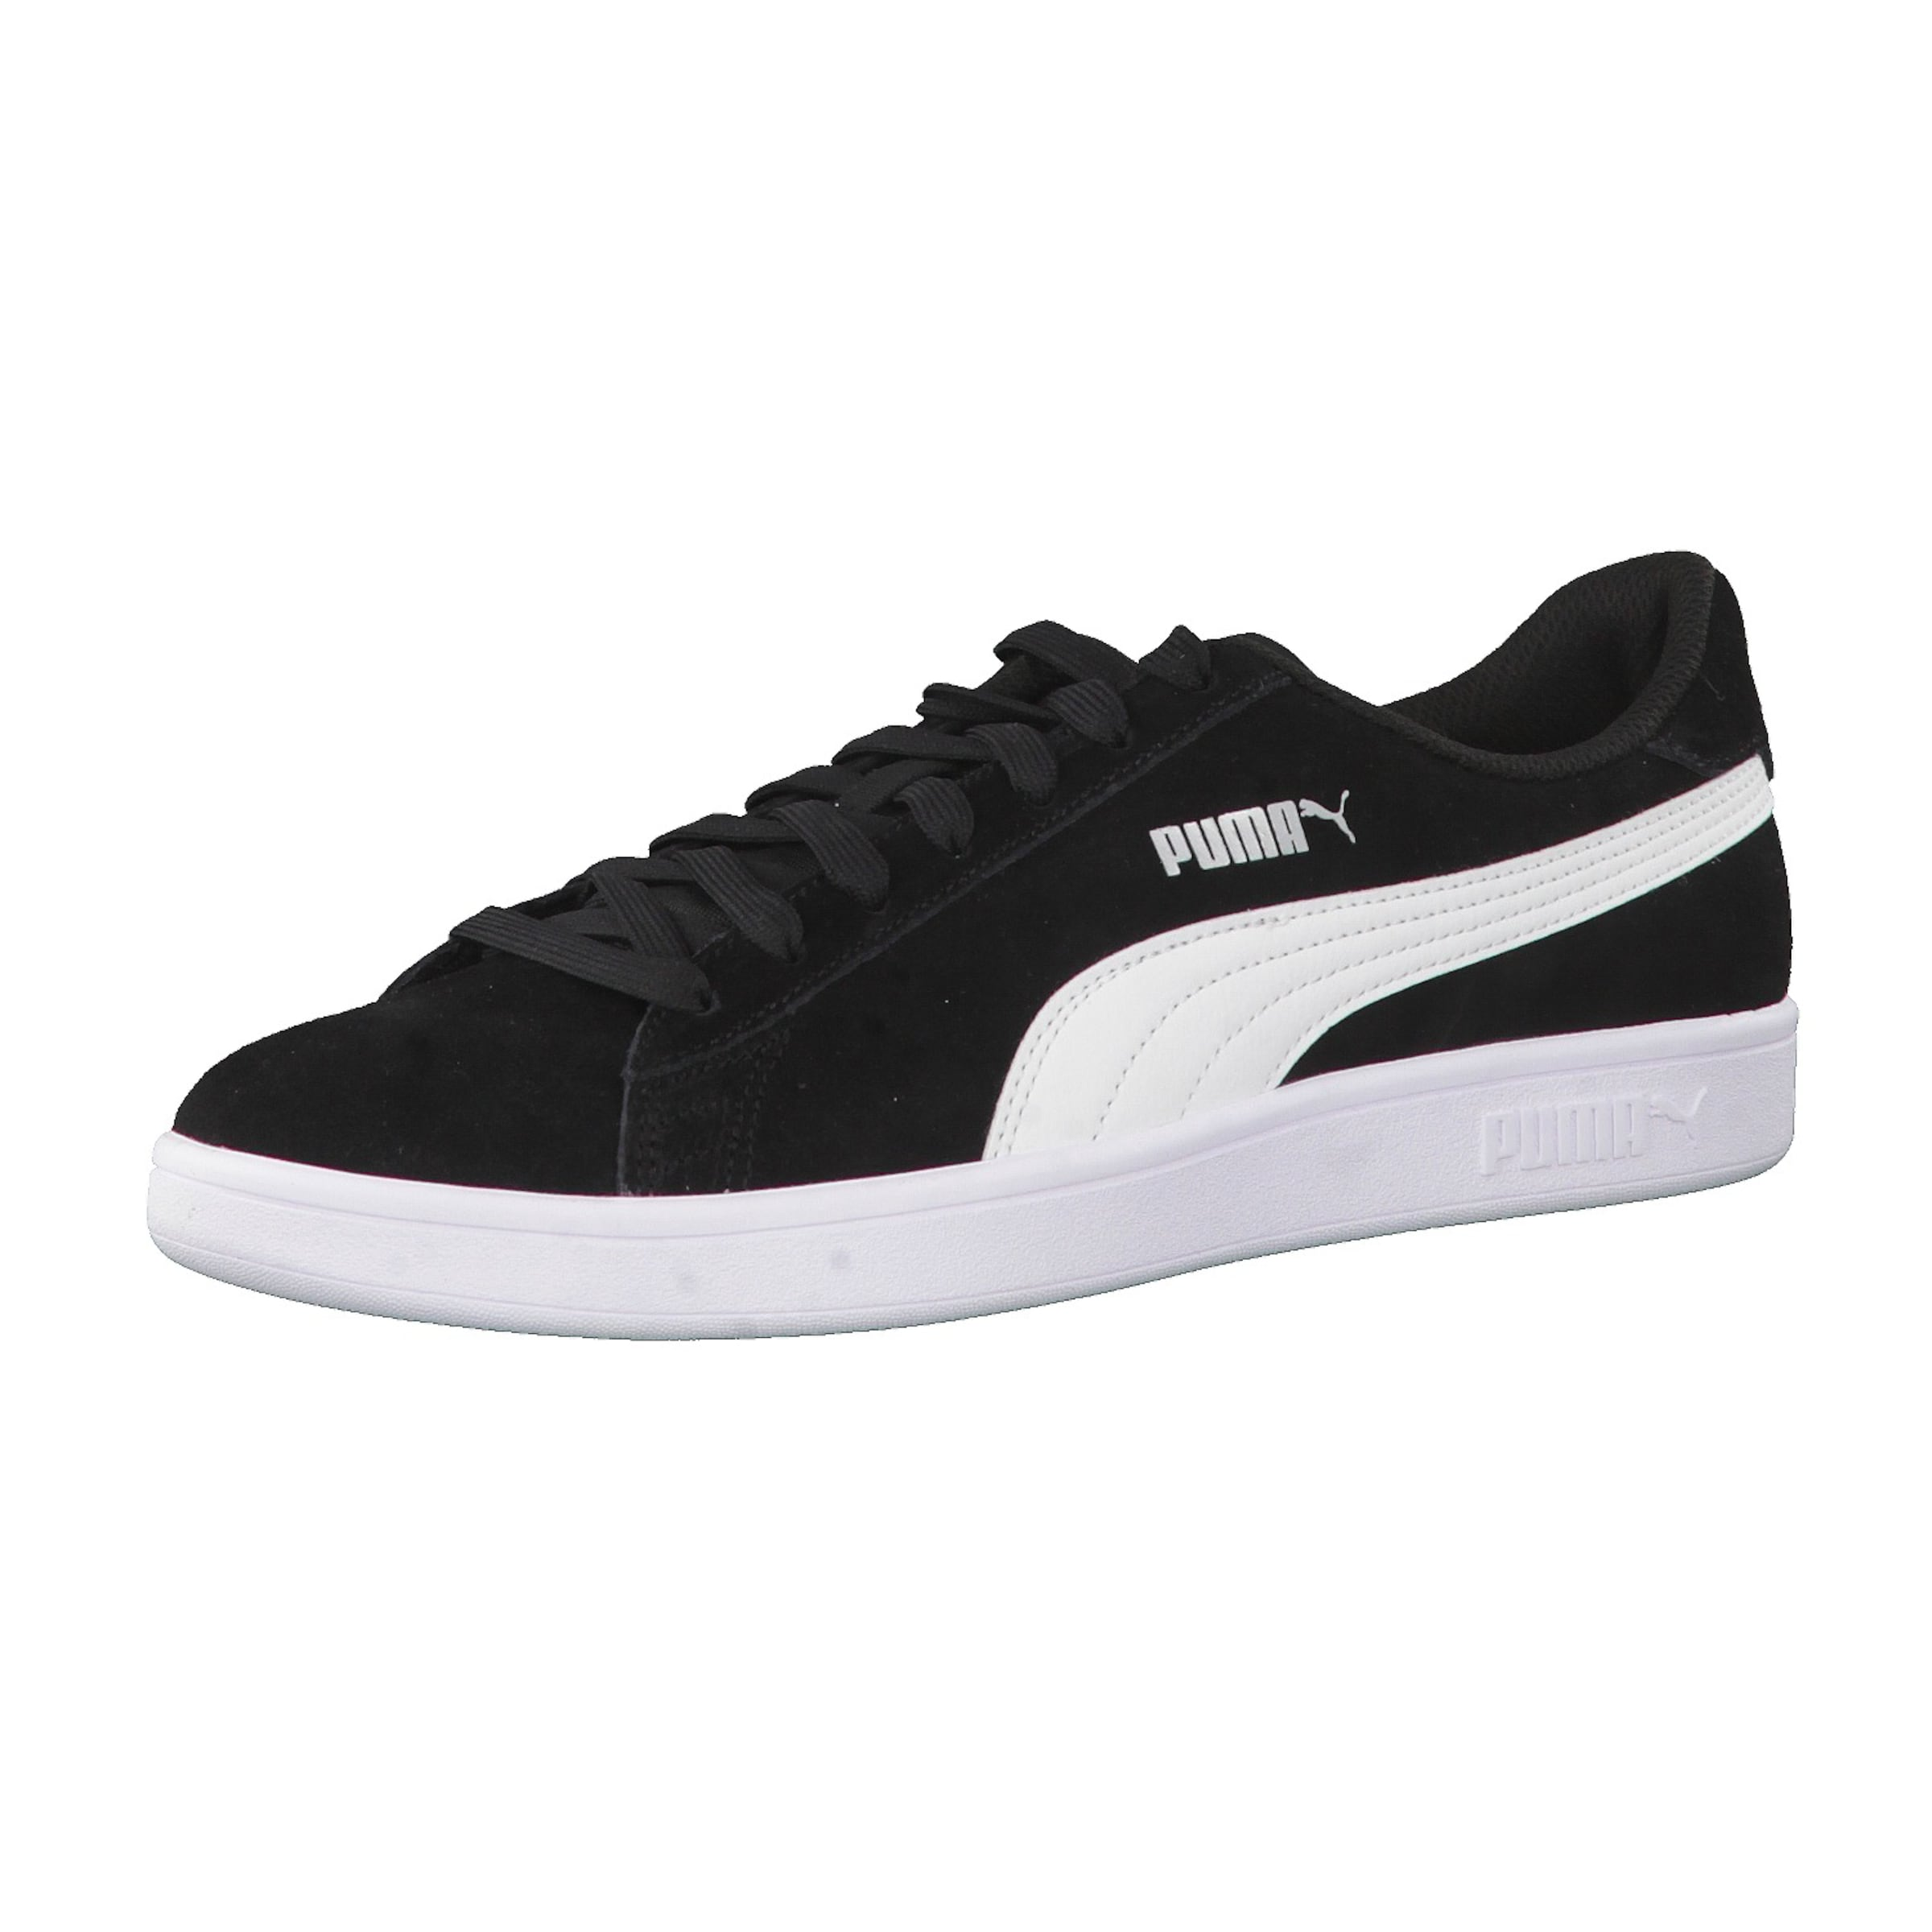 PUMA Sneaker Smash v2 364989-04 mit Grip-Außensohle